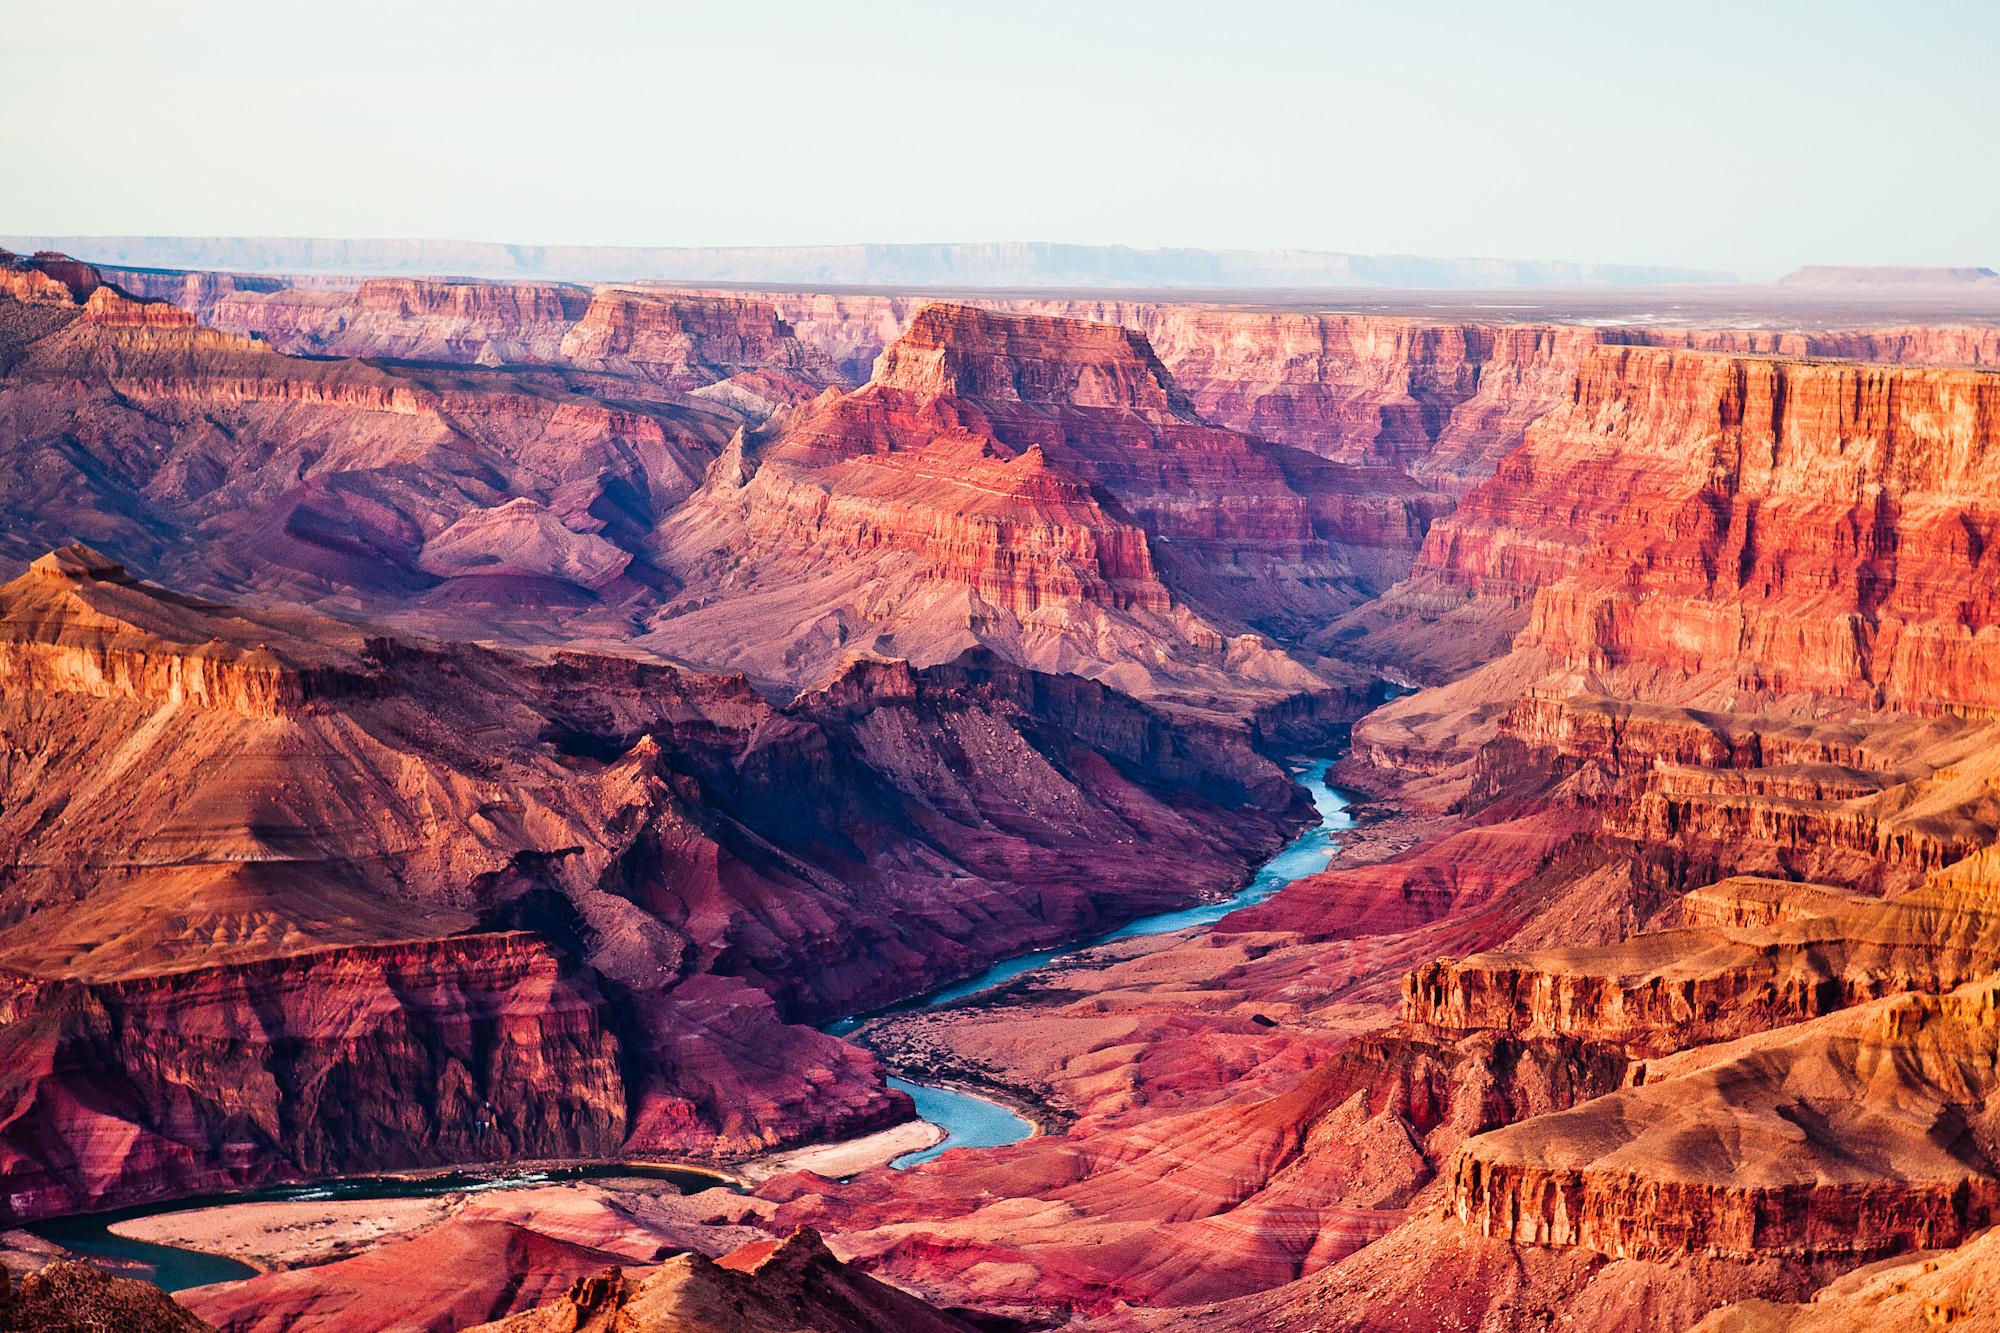 The South Rim grand canyon